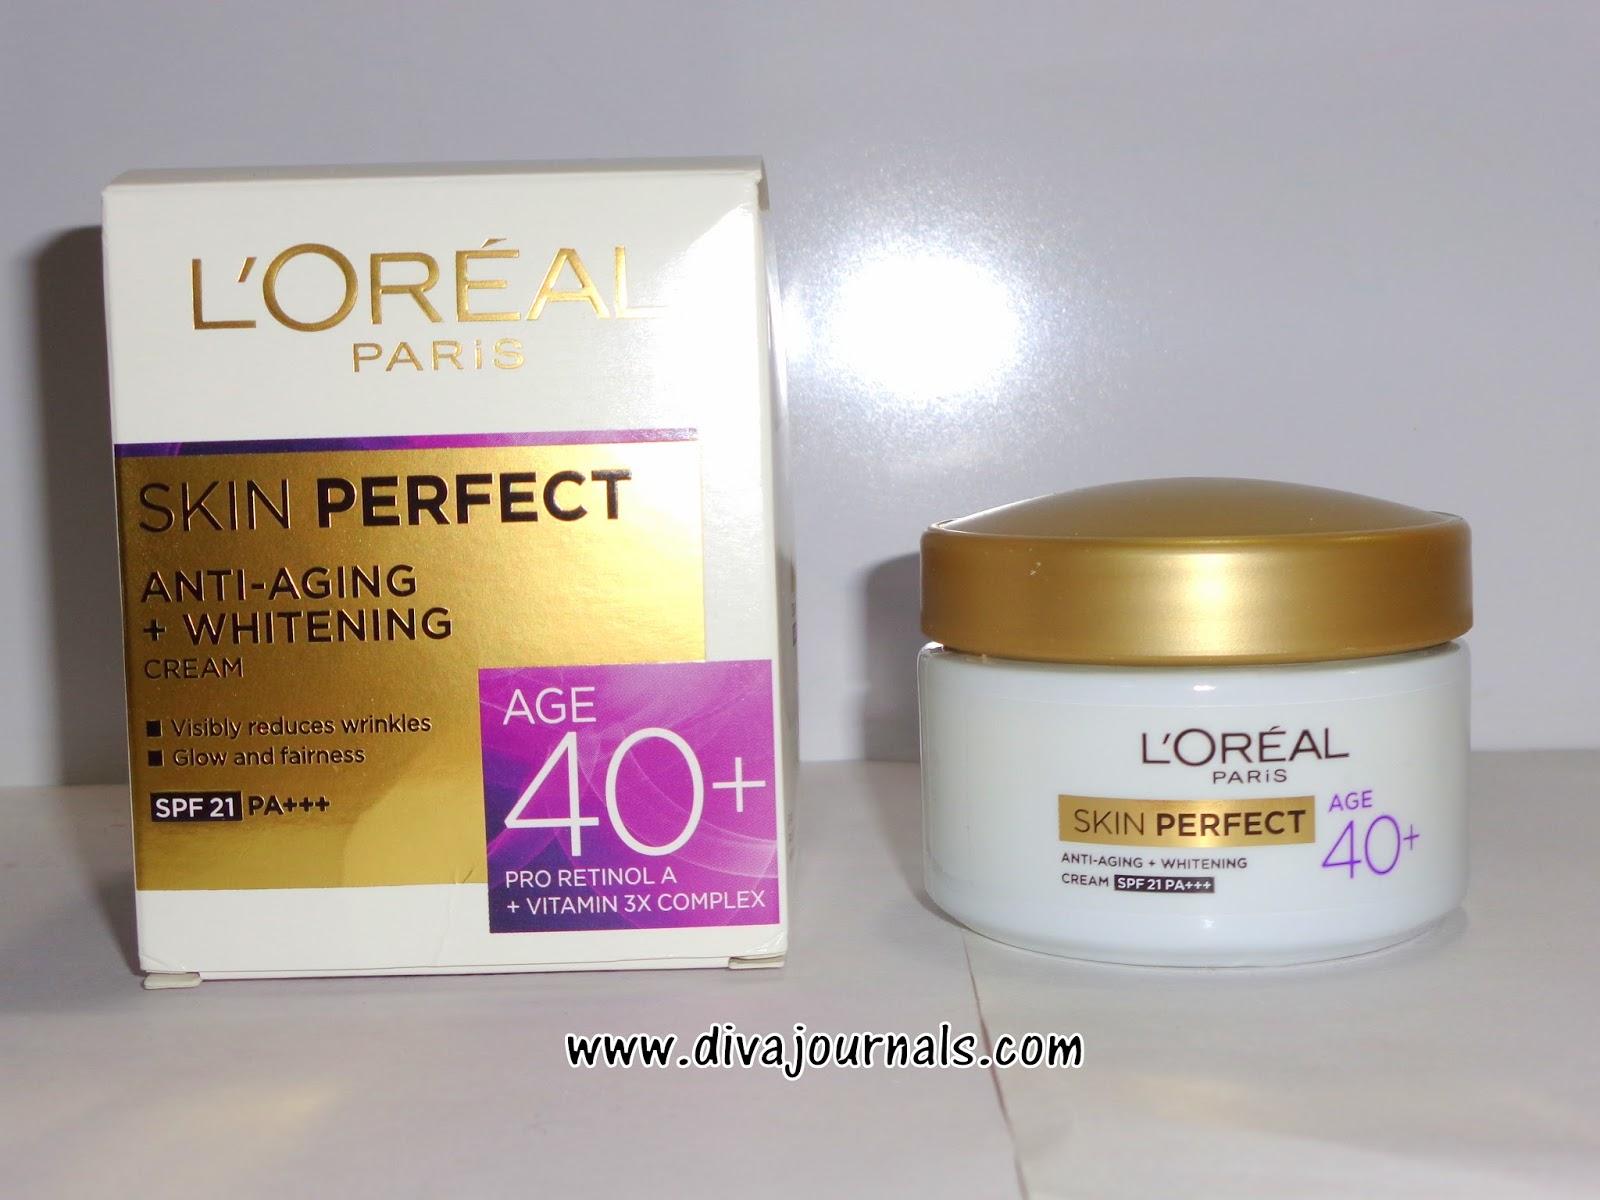 Loreal Paris Skin Perfect Anti-Aging+Whitening Cream for Age 40+